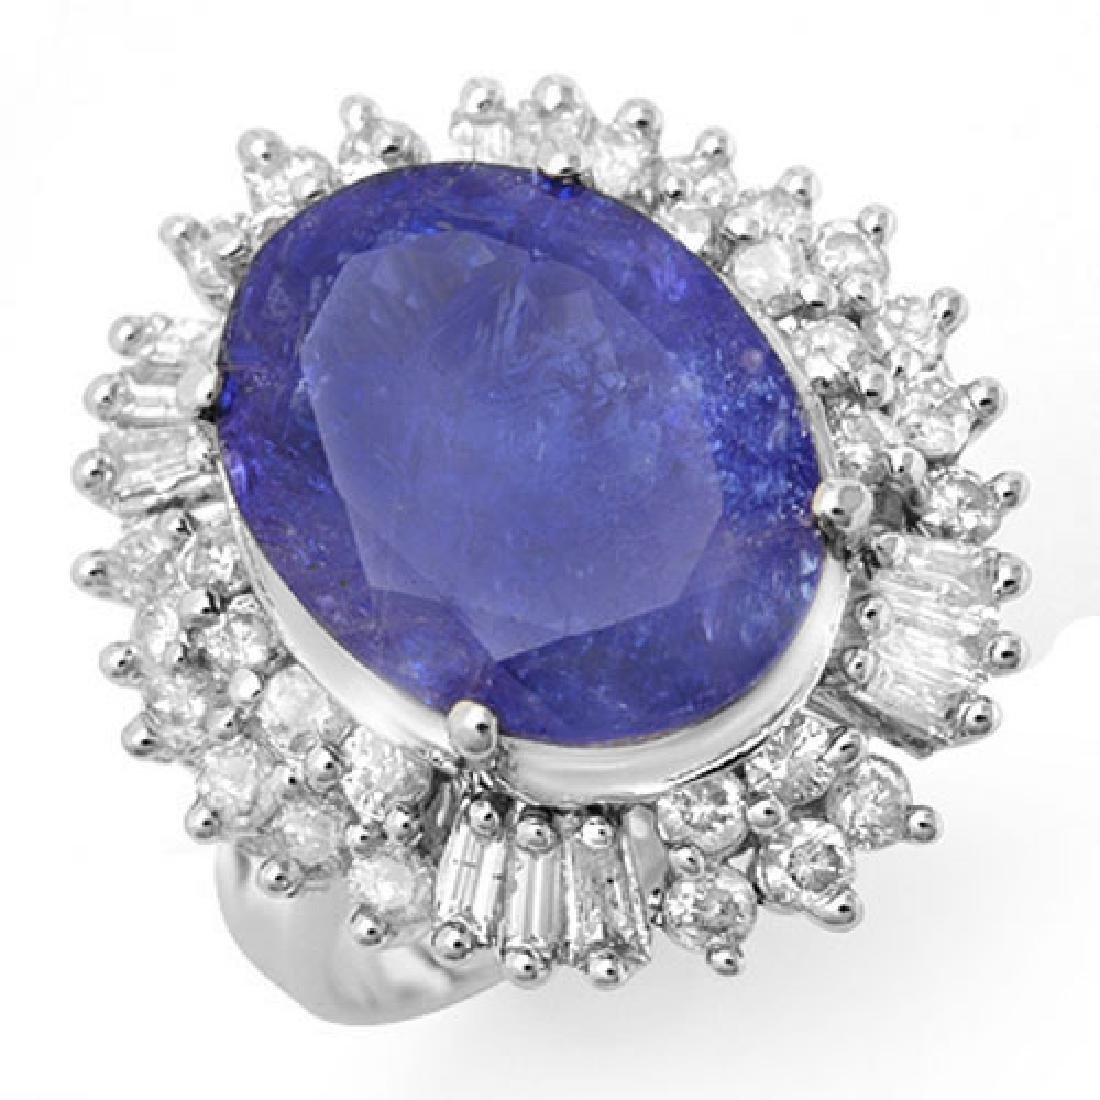 12.75 CTW Tanzanite & Diamond Ring 18K White Gold